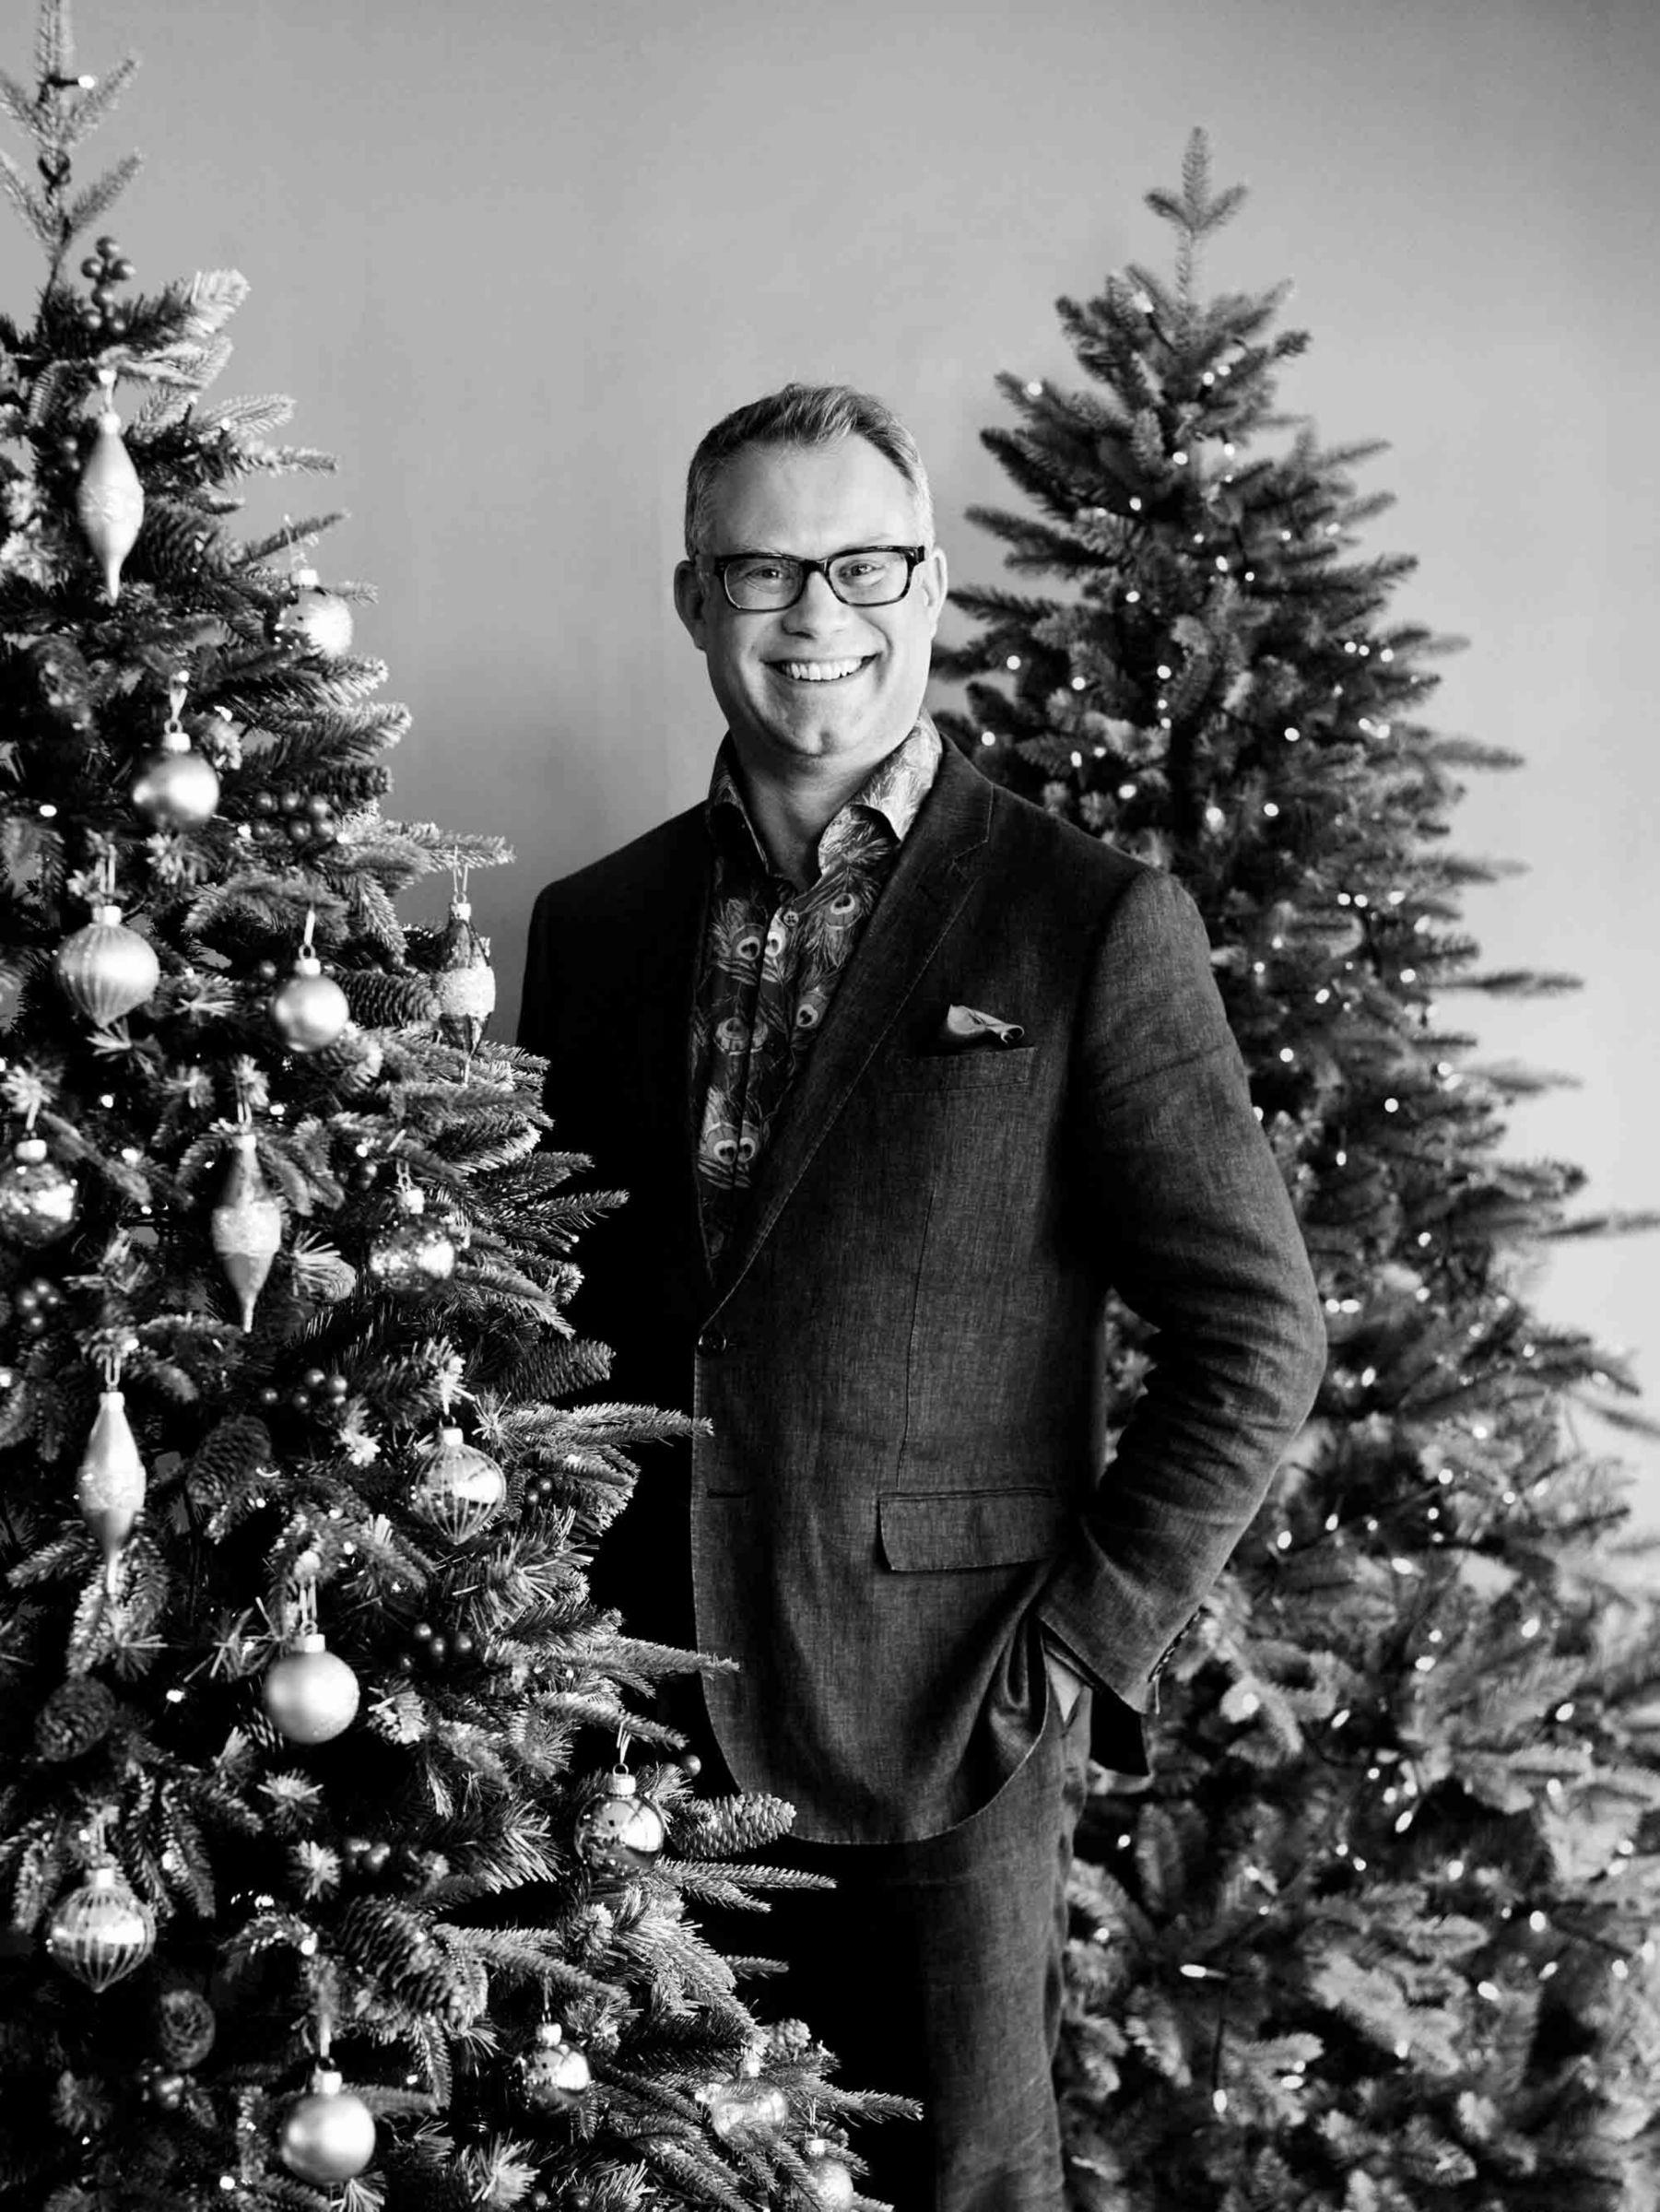 Christmas | Christmas Gift Ideas & Presents | John Lewis & Partners